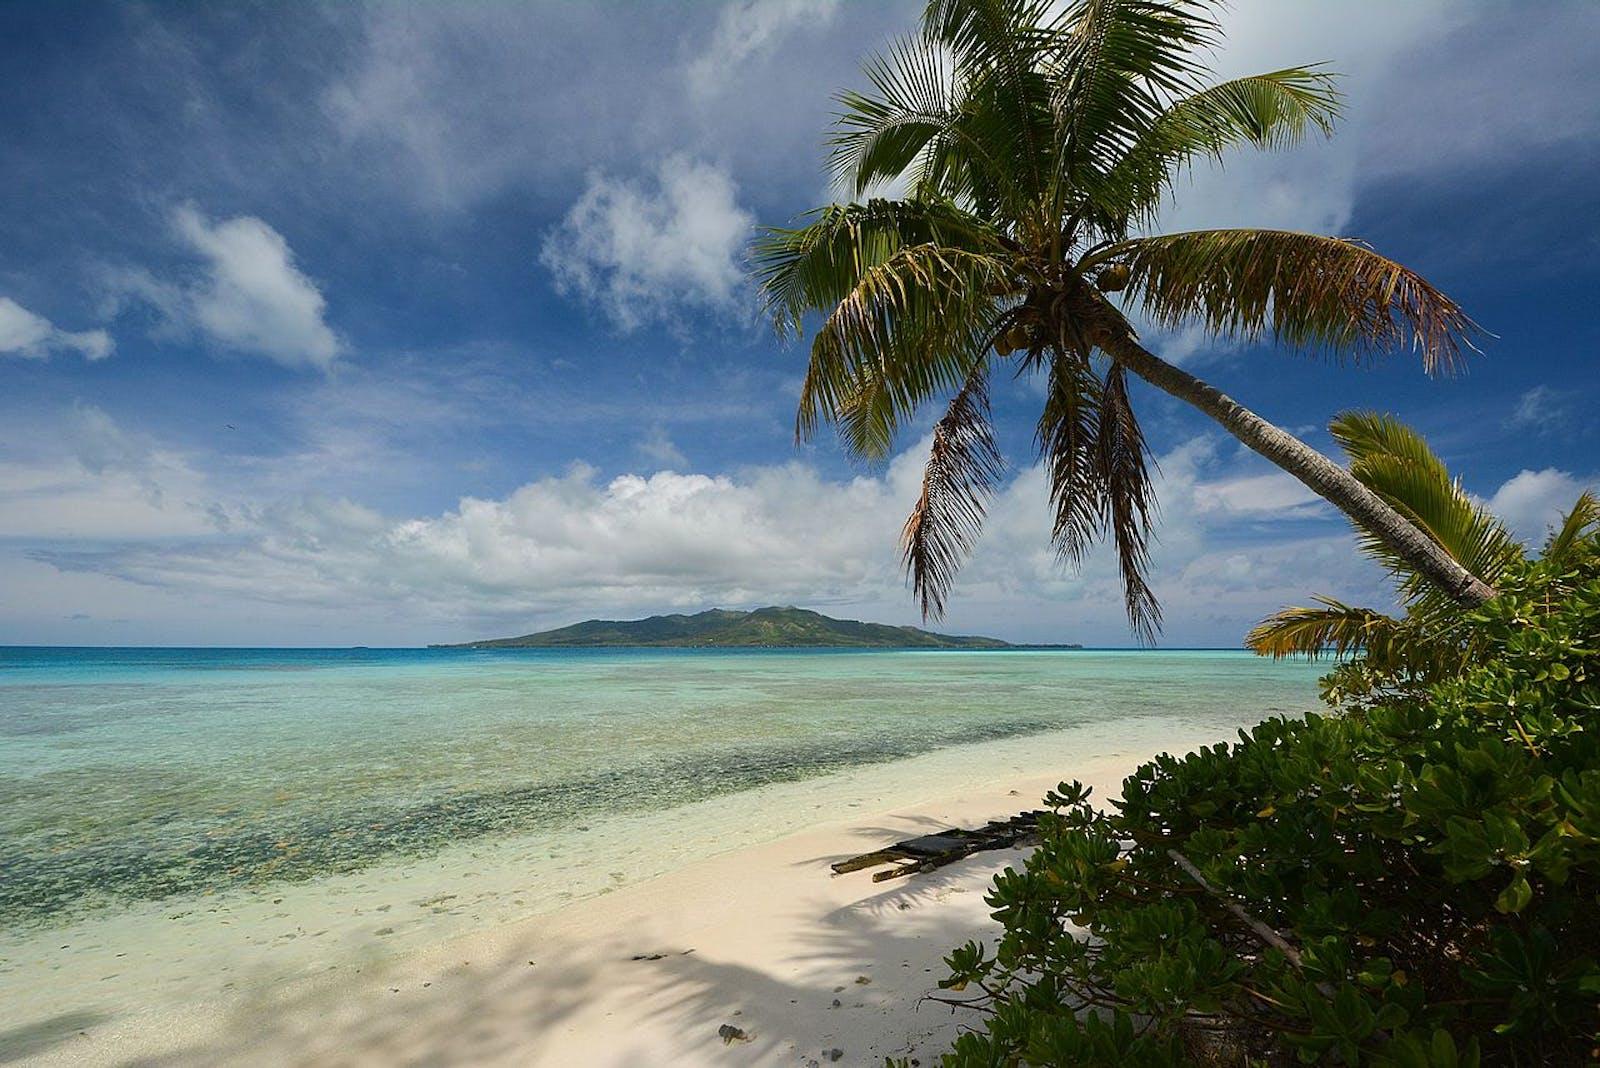 Tubuai Tropical Moist Forests